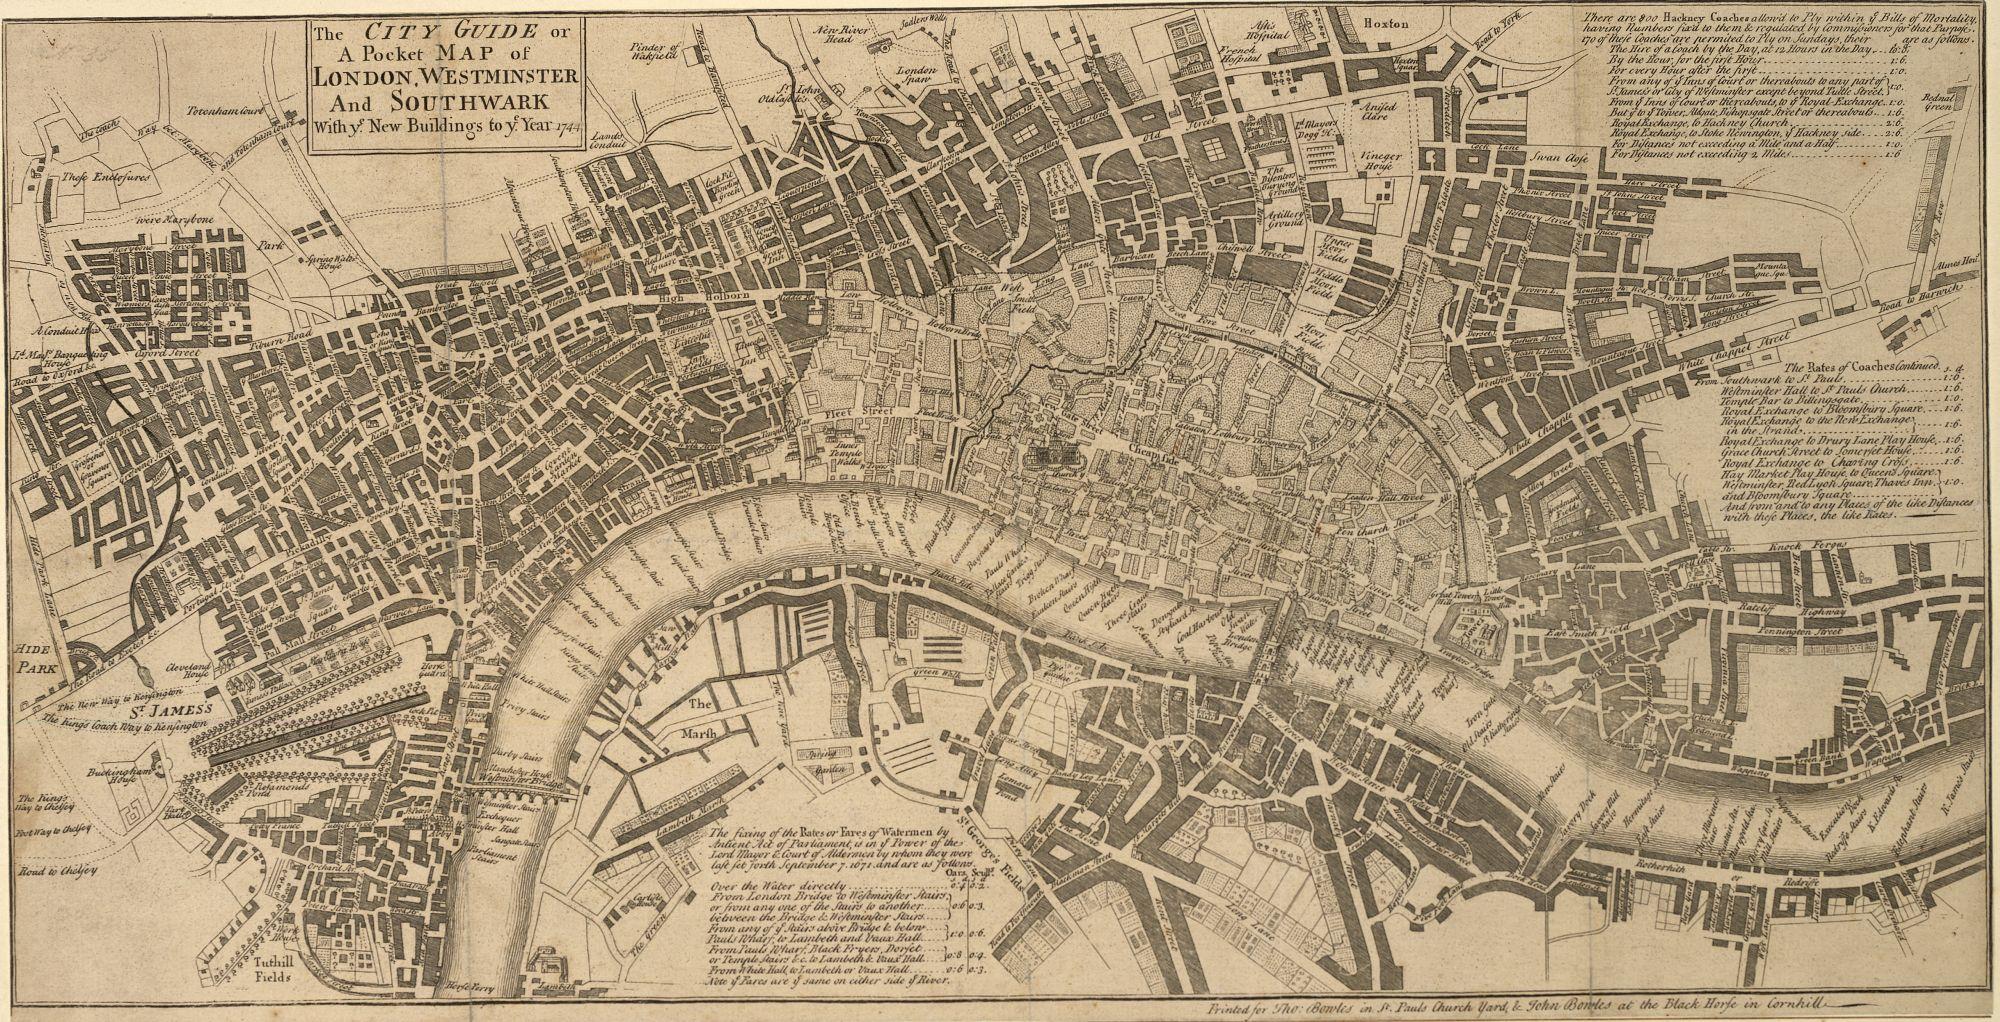 John Bowles' Pocket Map of London.